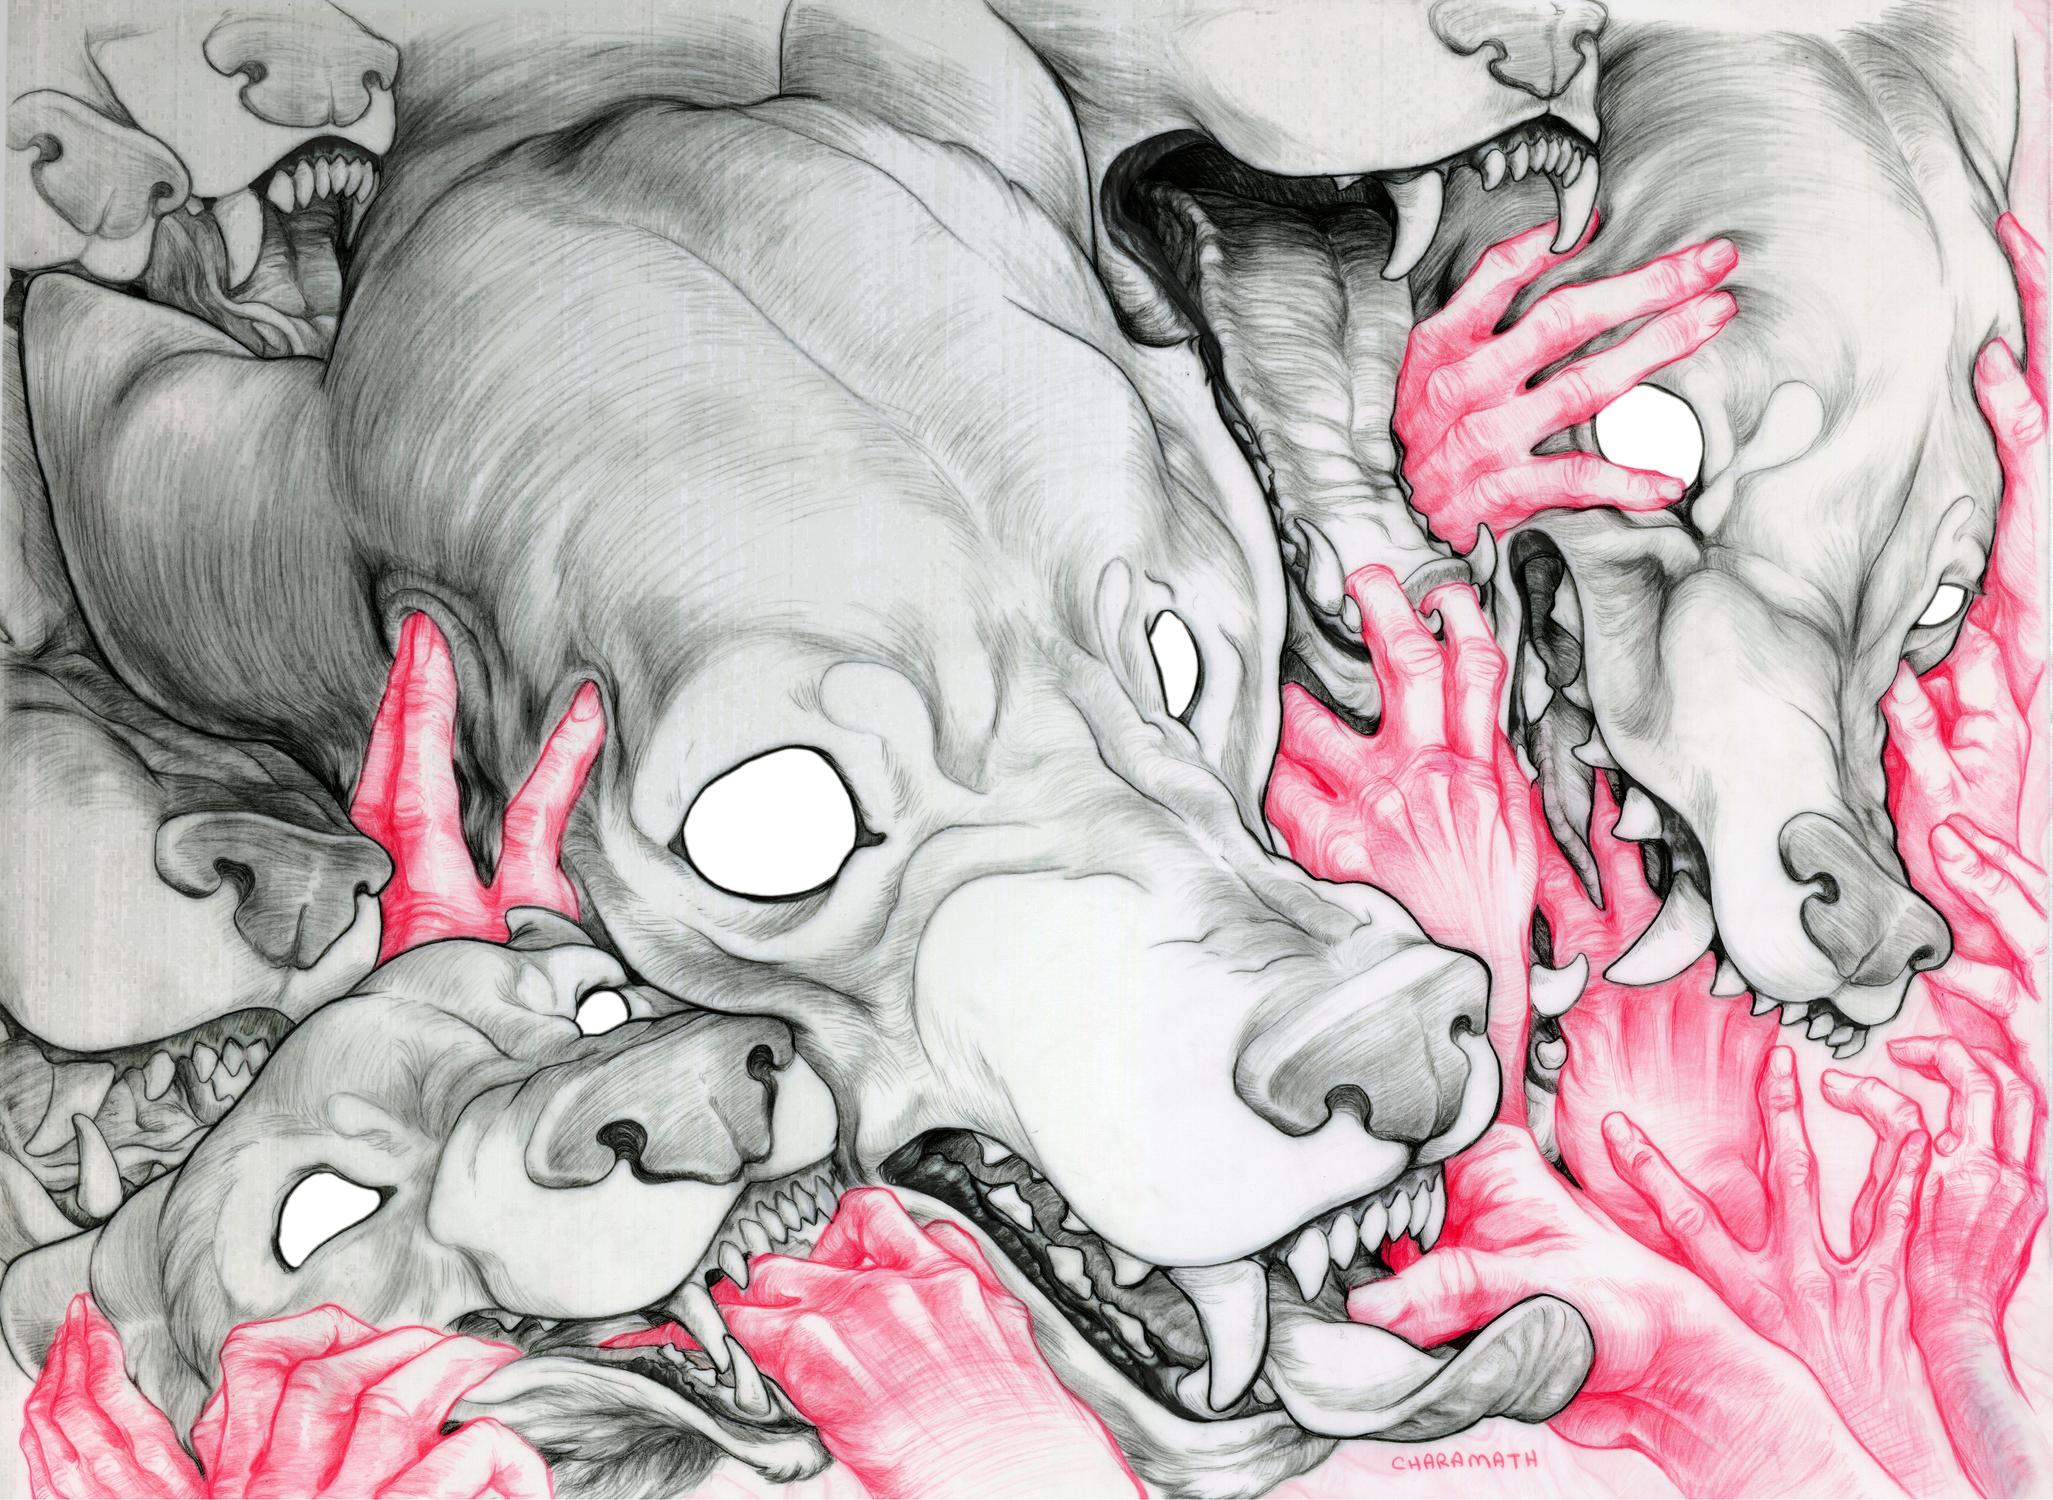 Consume Artwork by Audre Schutte